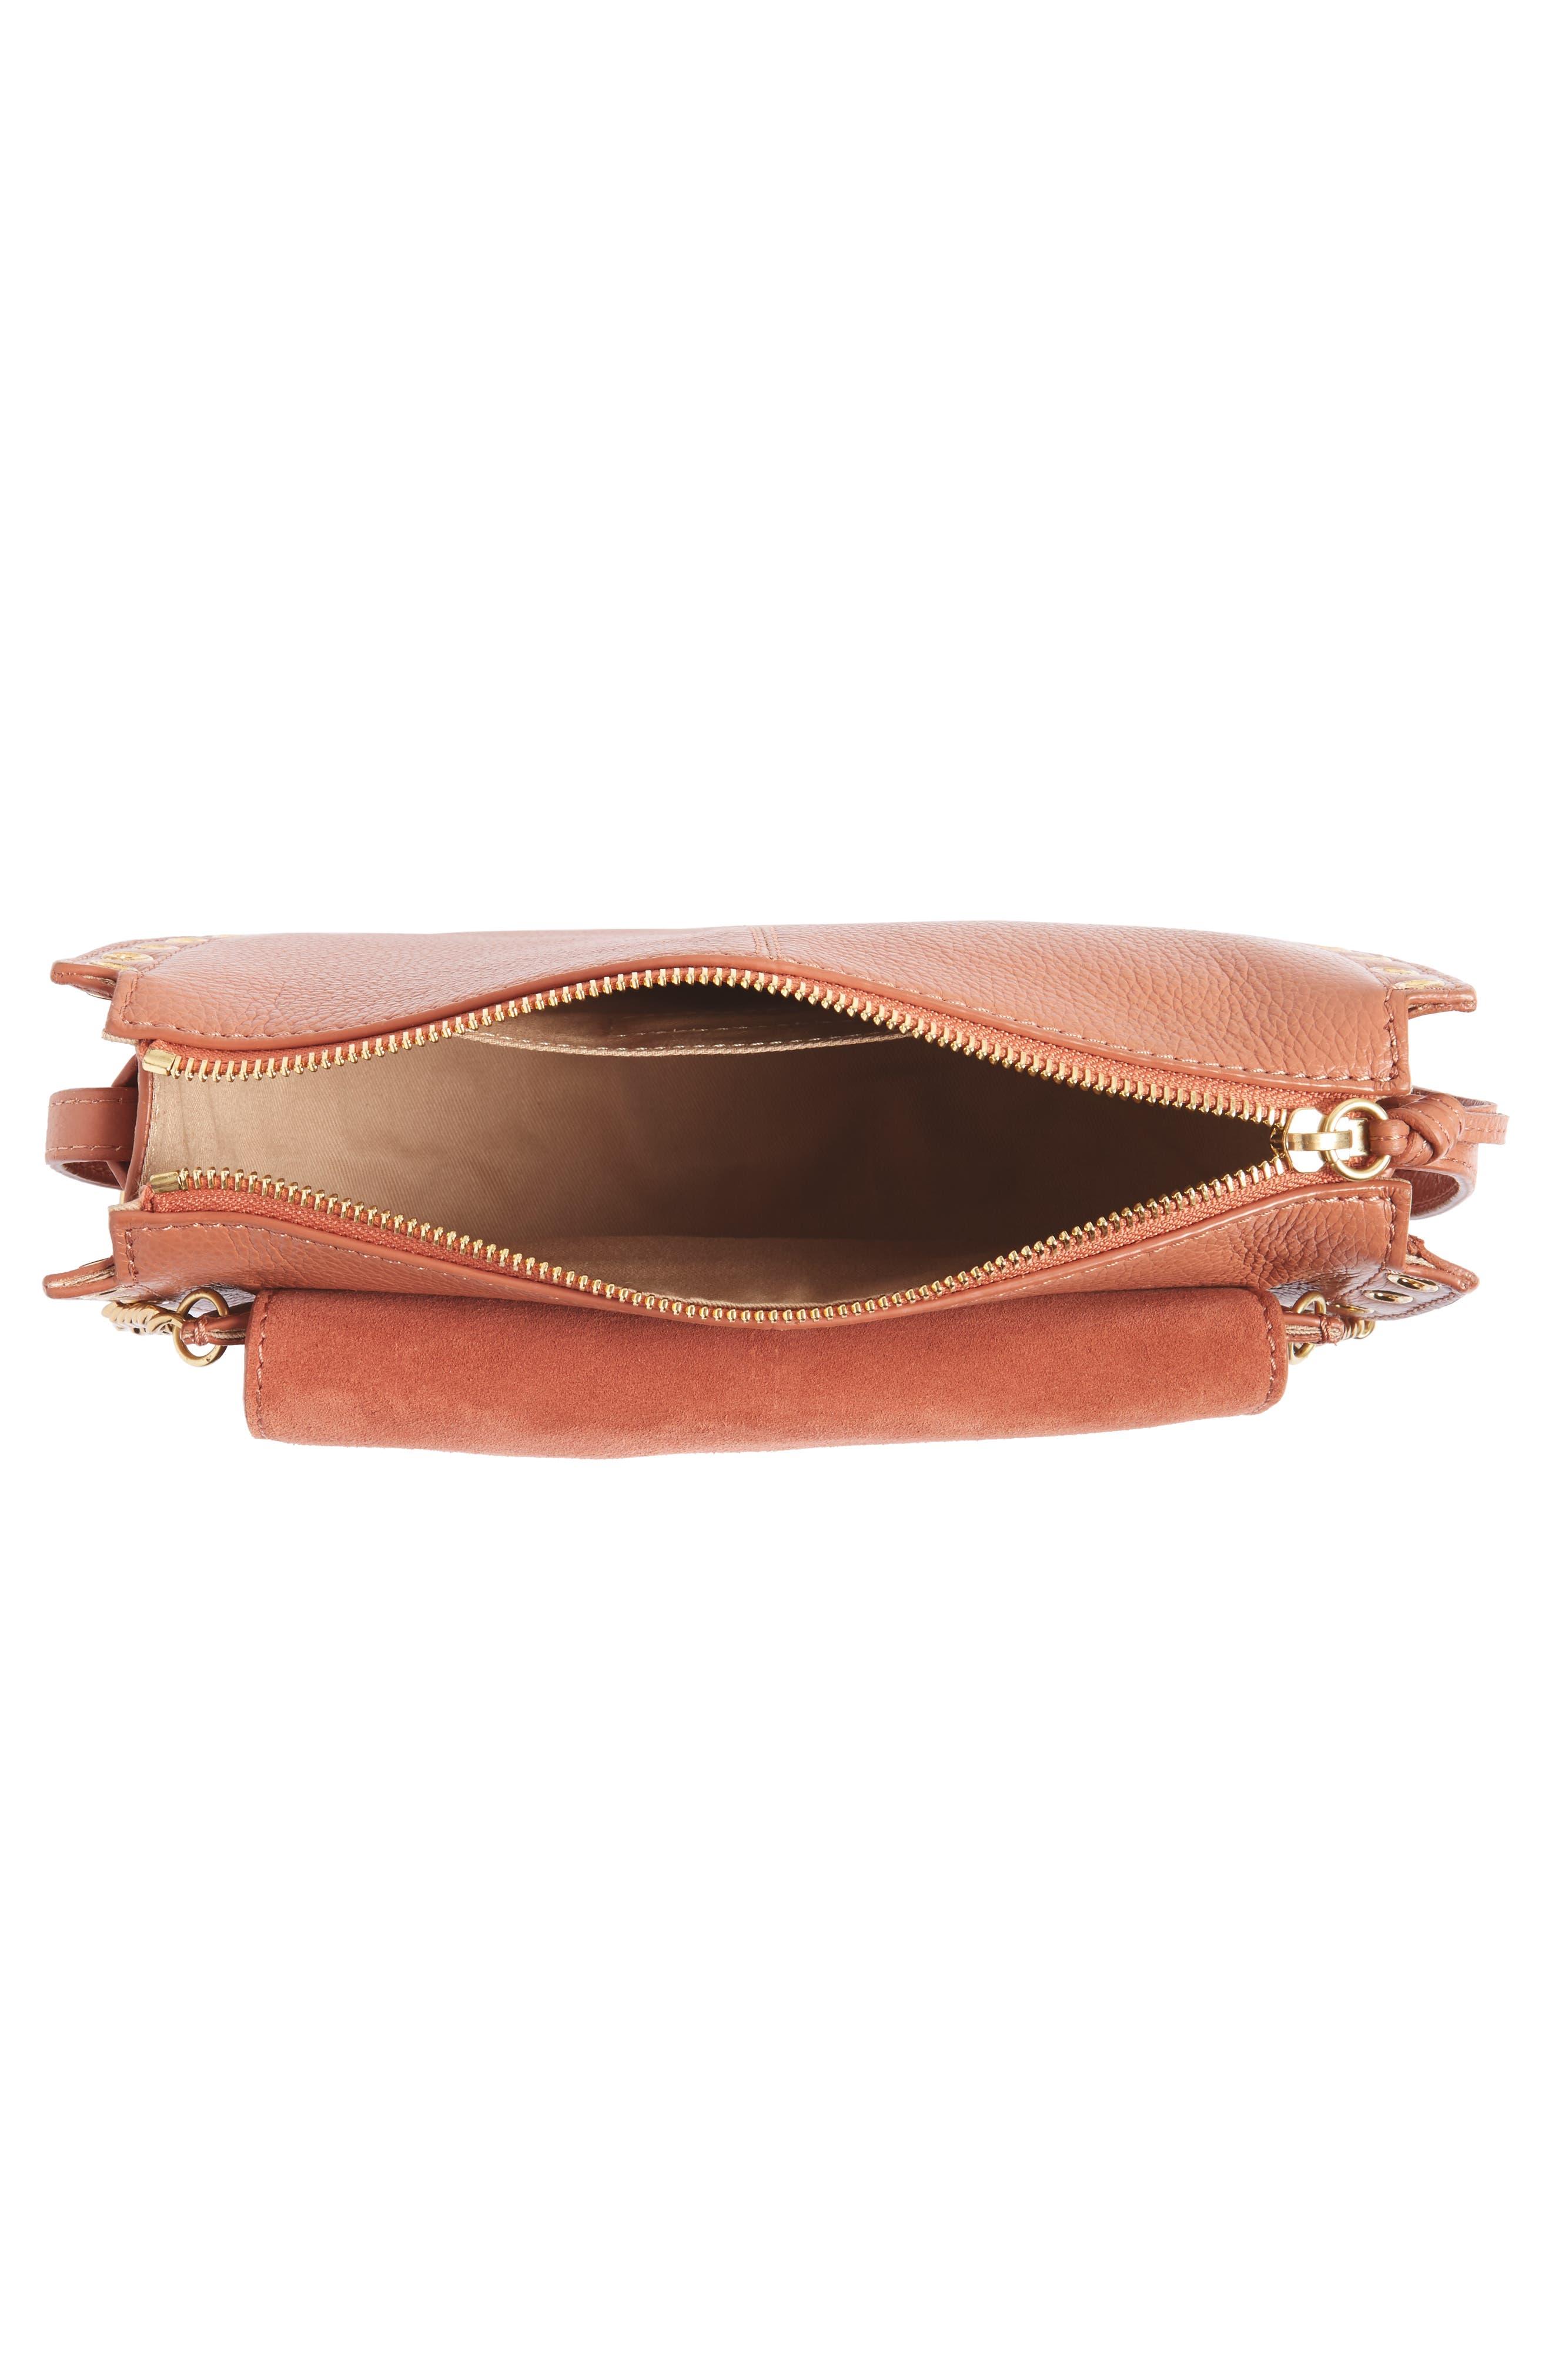 Kriss Leather & Suede Grommet Shoulder Bag,                             Alternate thumbnail 4, color,                             Cheek